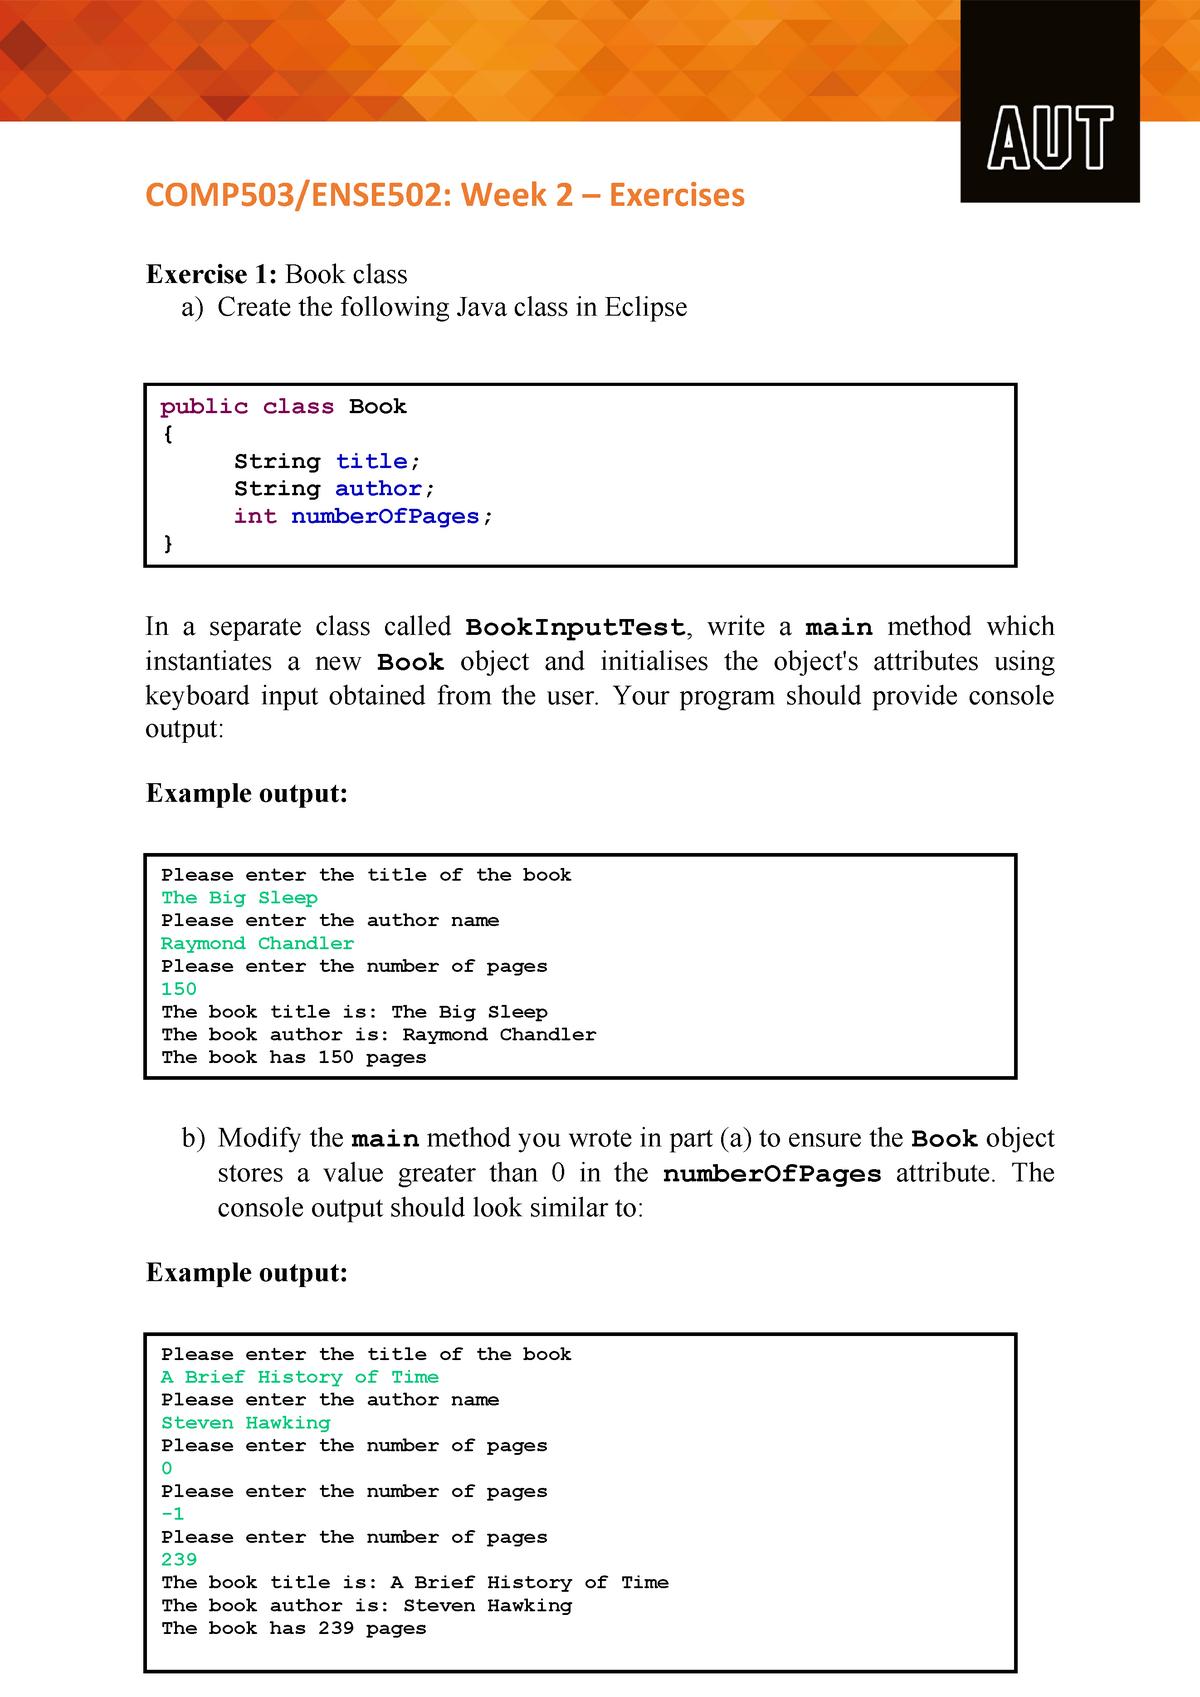 Week 2 - Lab Exercises - COMP503: Programming 2 - StuDocu